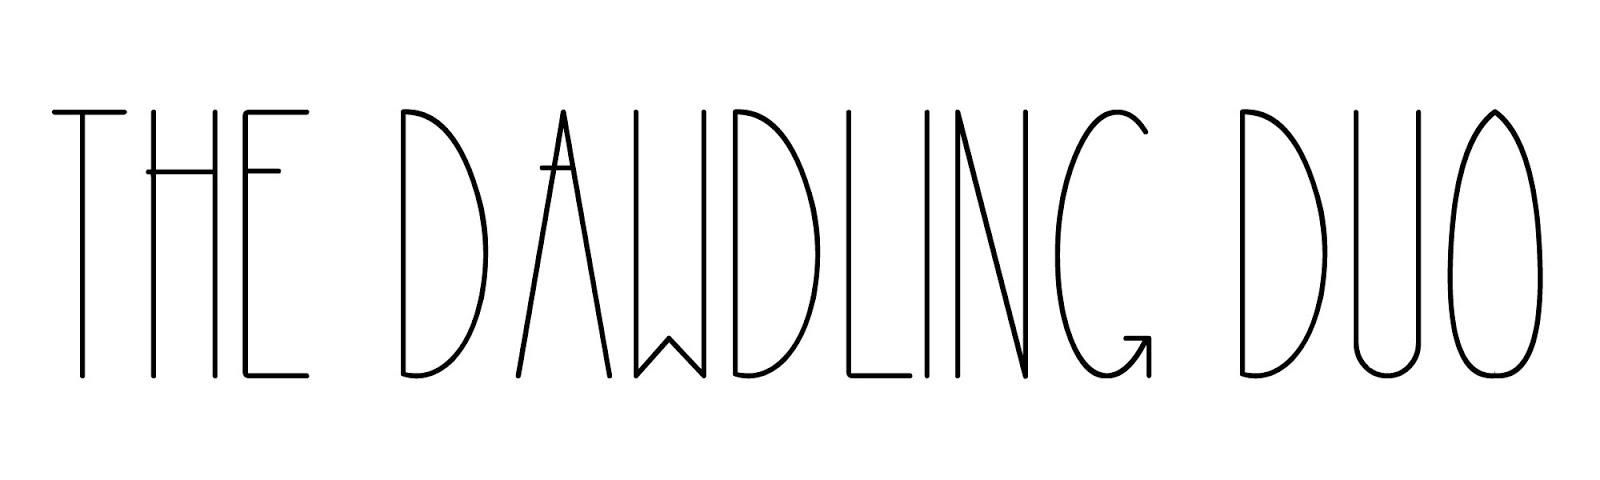 The Dawdling Duo